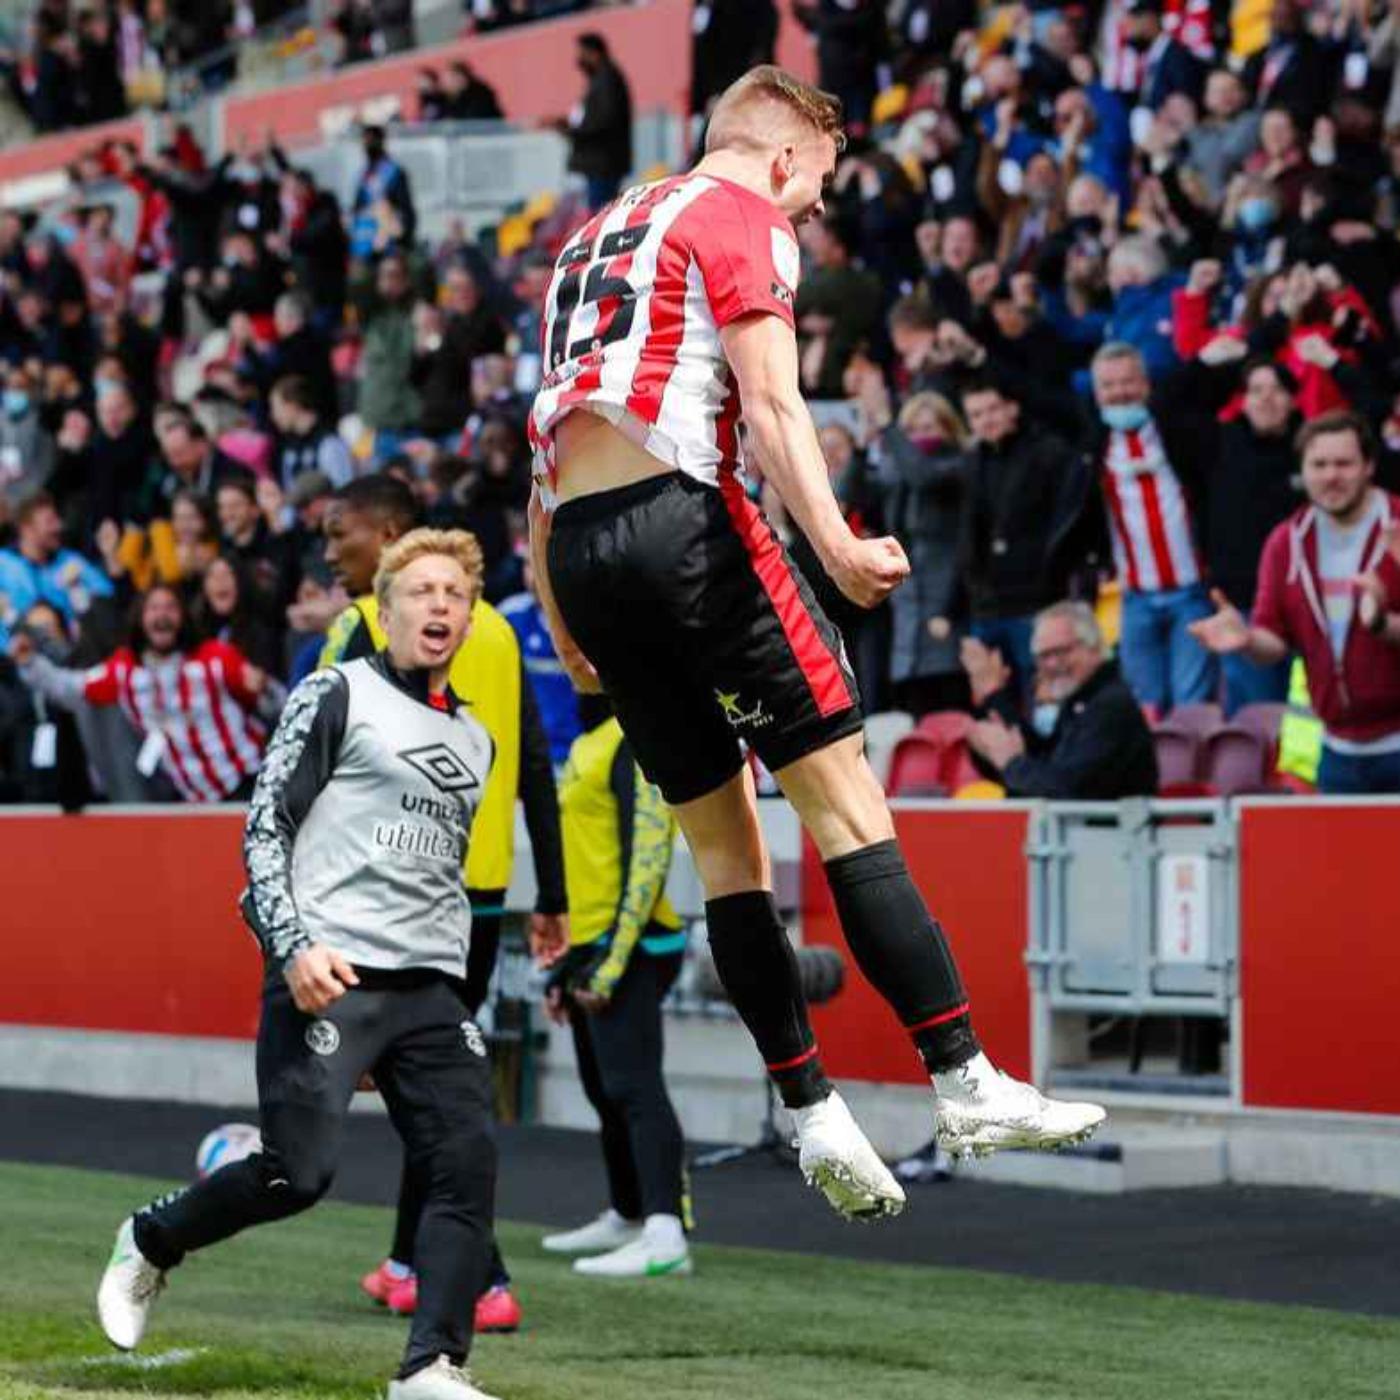 Brentford V Bournemouth (Play-Off Semi Final 2nd leg)